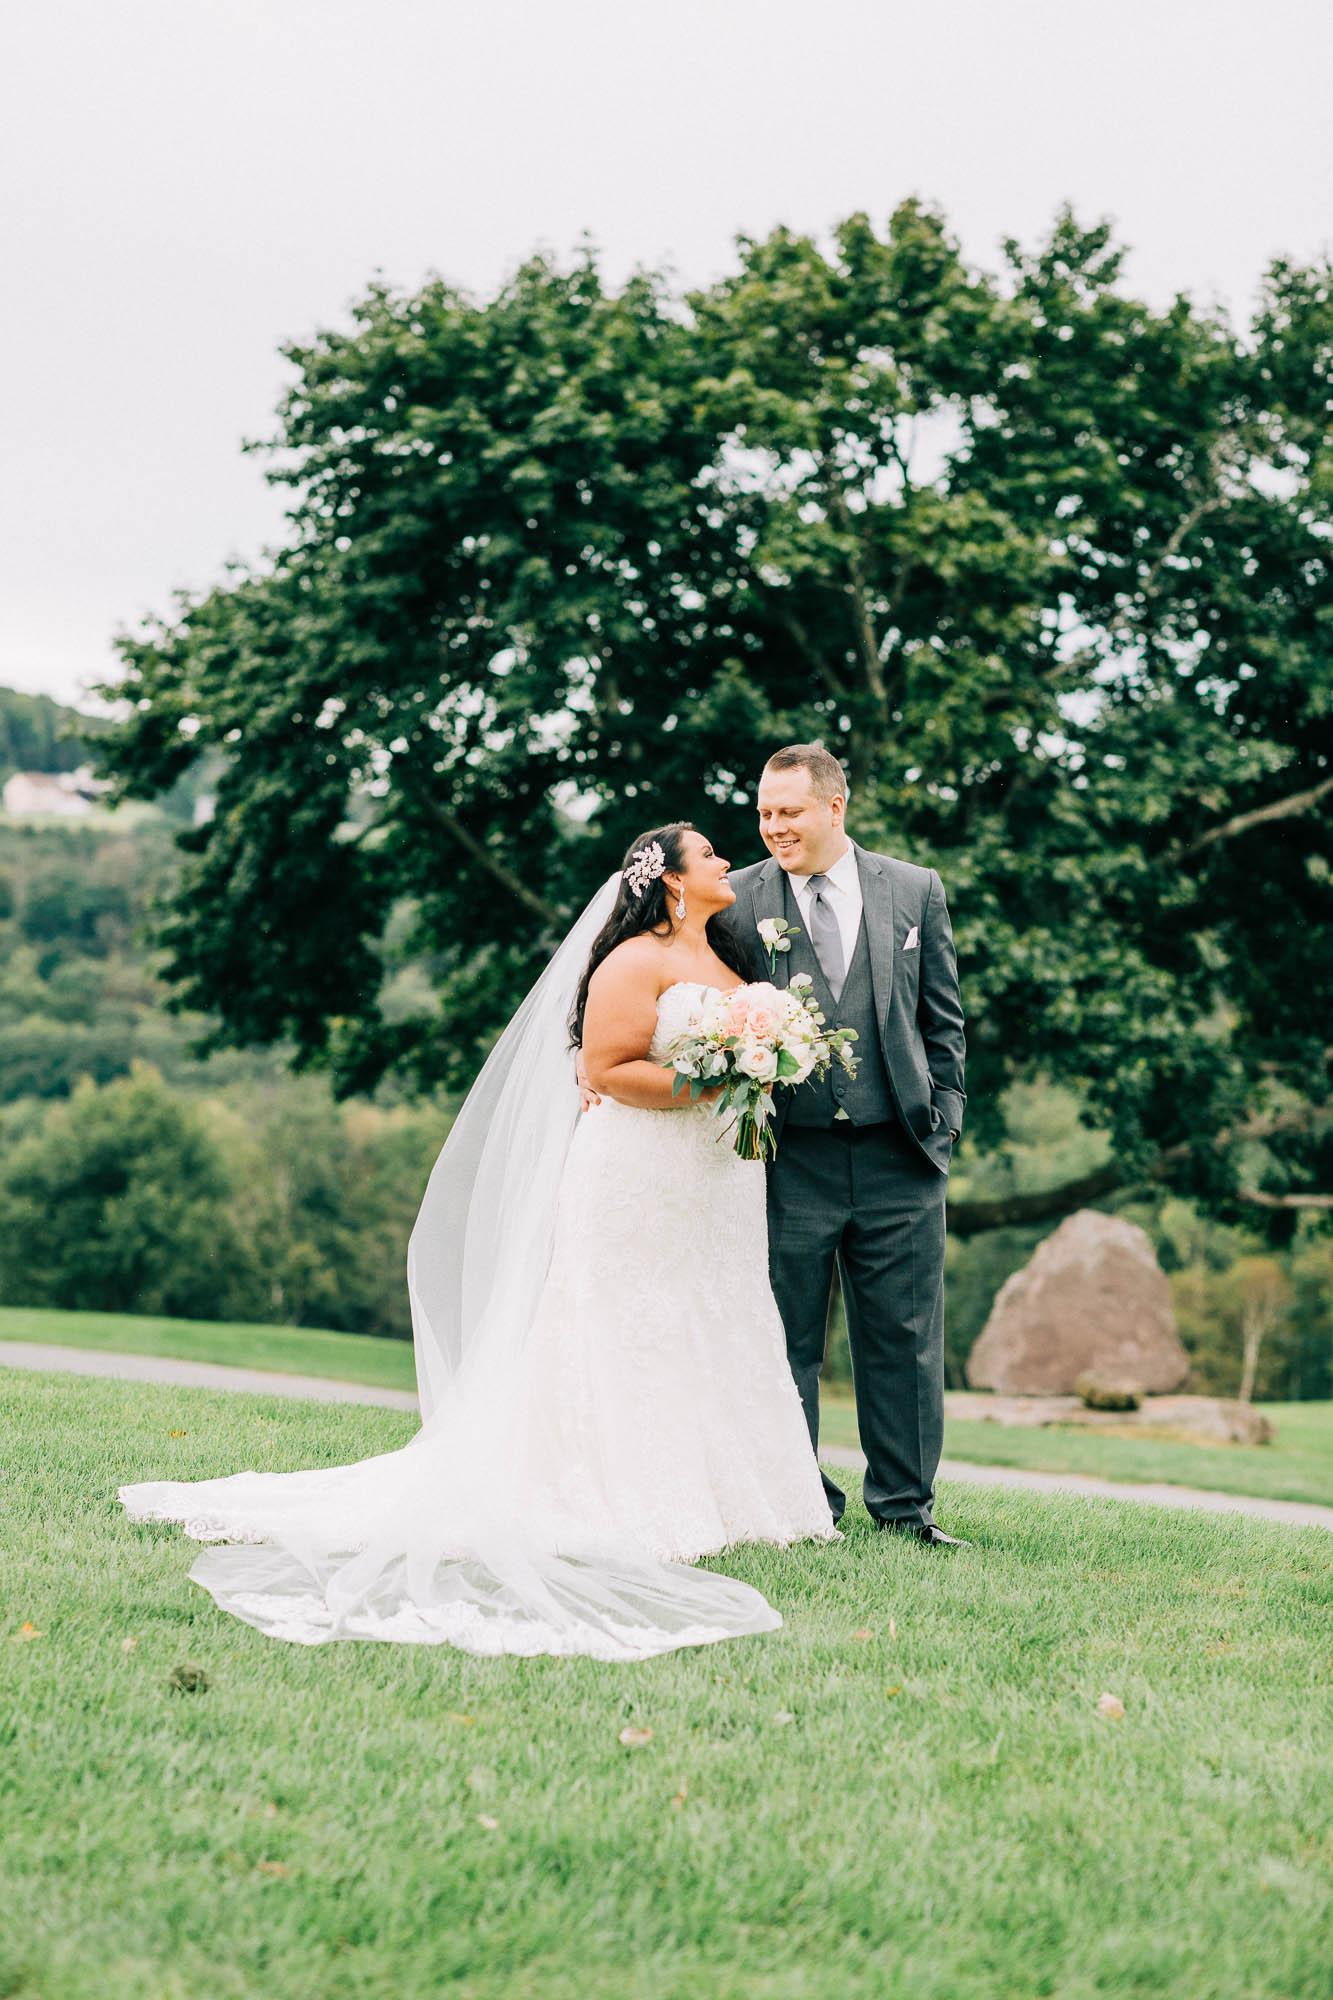 stonhedge-country-club-wedding-8708.jpg